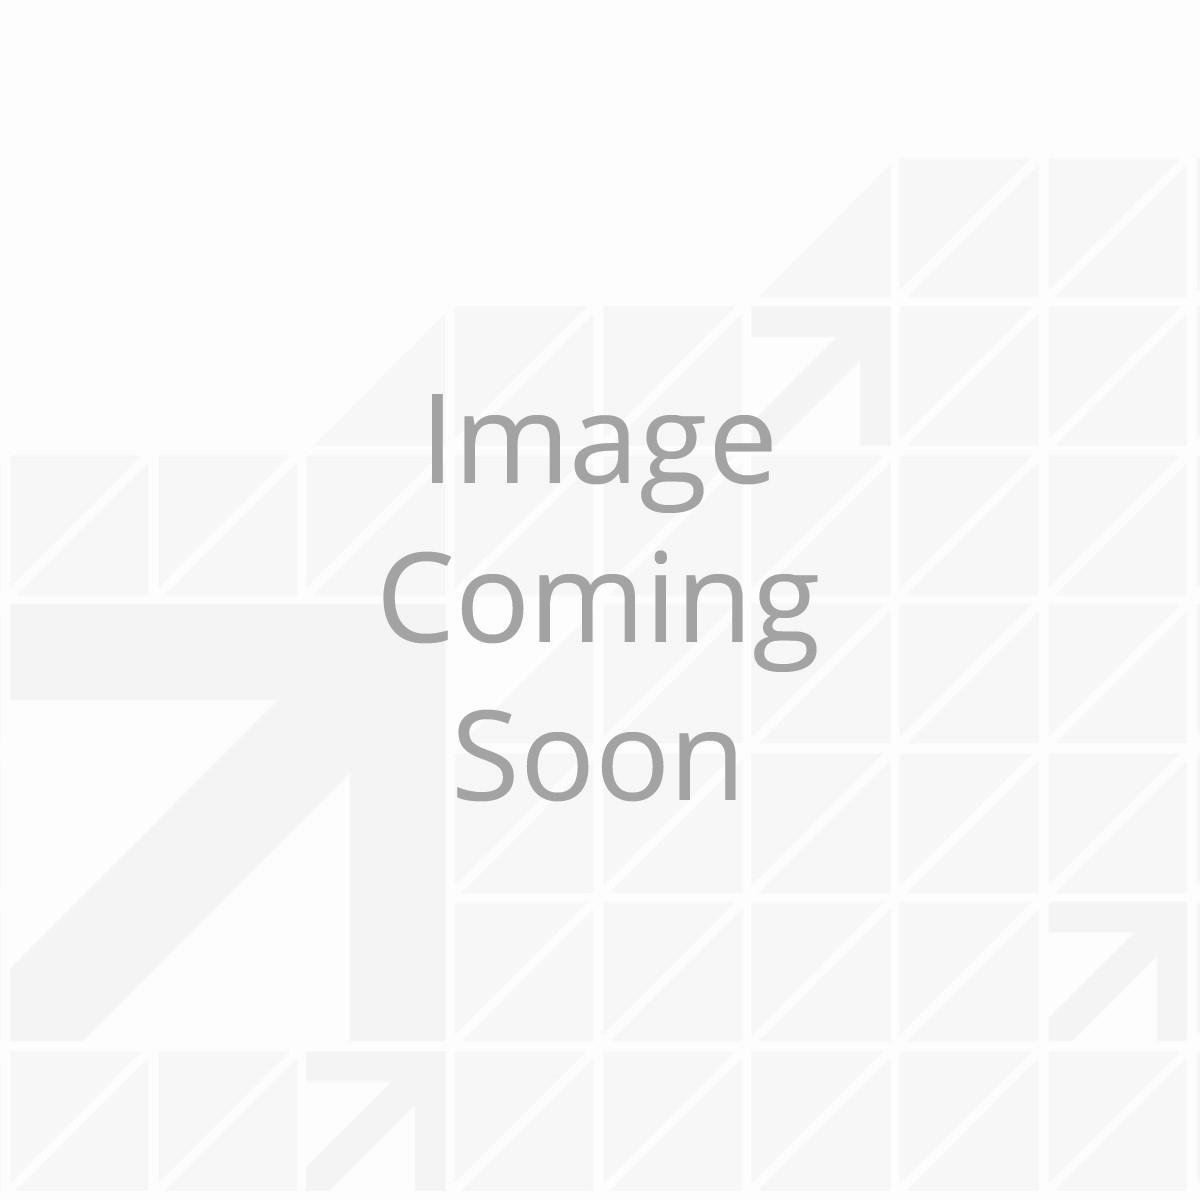 "SecureLatch Lunette Ring Channel (2-3/4"" ID, 11-3/4"" High)"